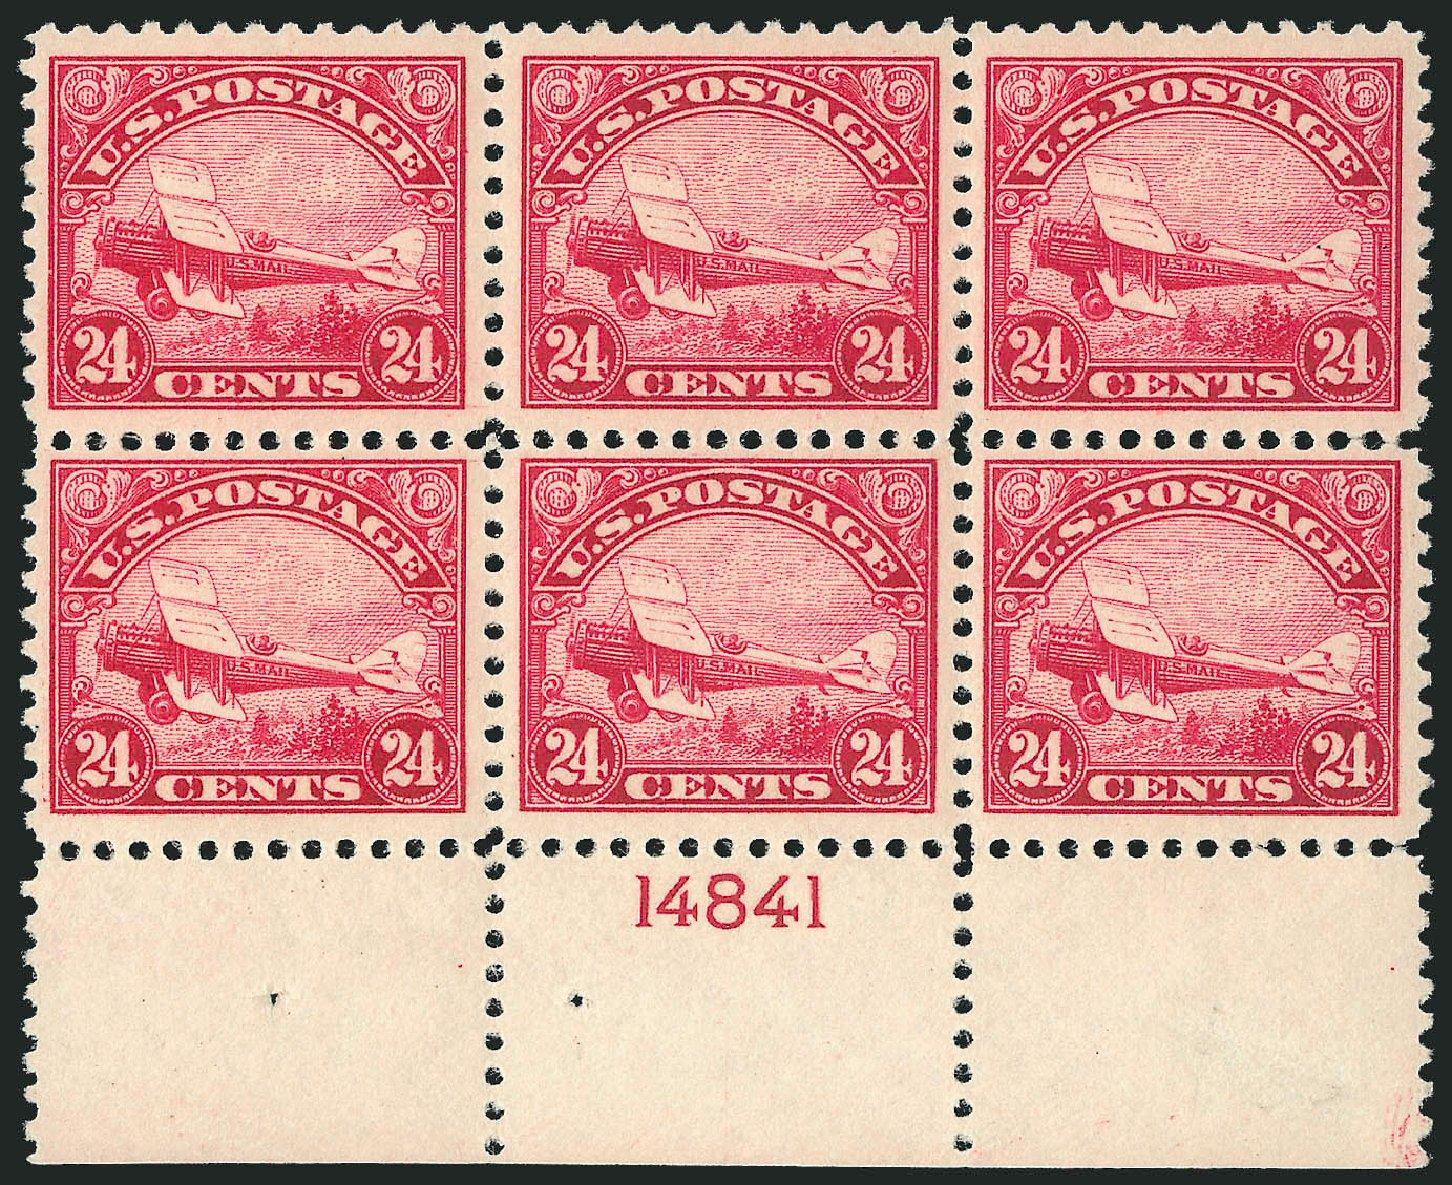 US Stamps Price Scott Catalog #C6 - 24c 1923 Air DeHavilland Biplane. Robert Siegel Auction Galleries, Feb 2015, Sale 1092, Lot 1405